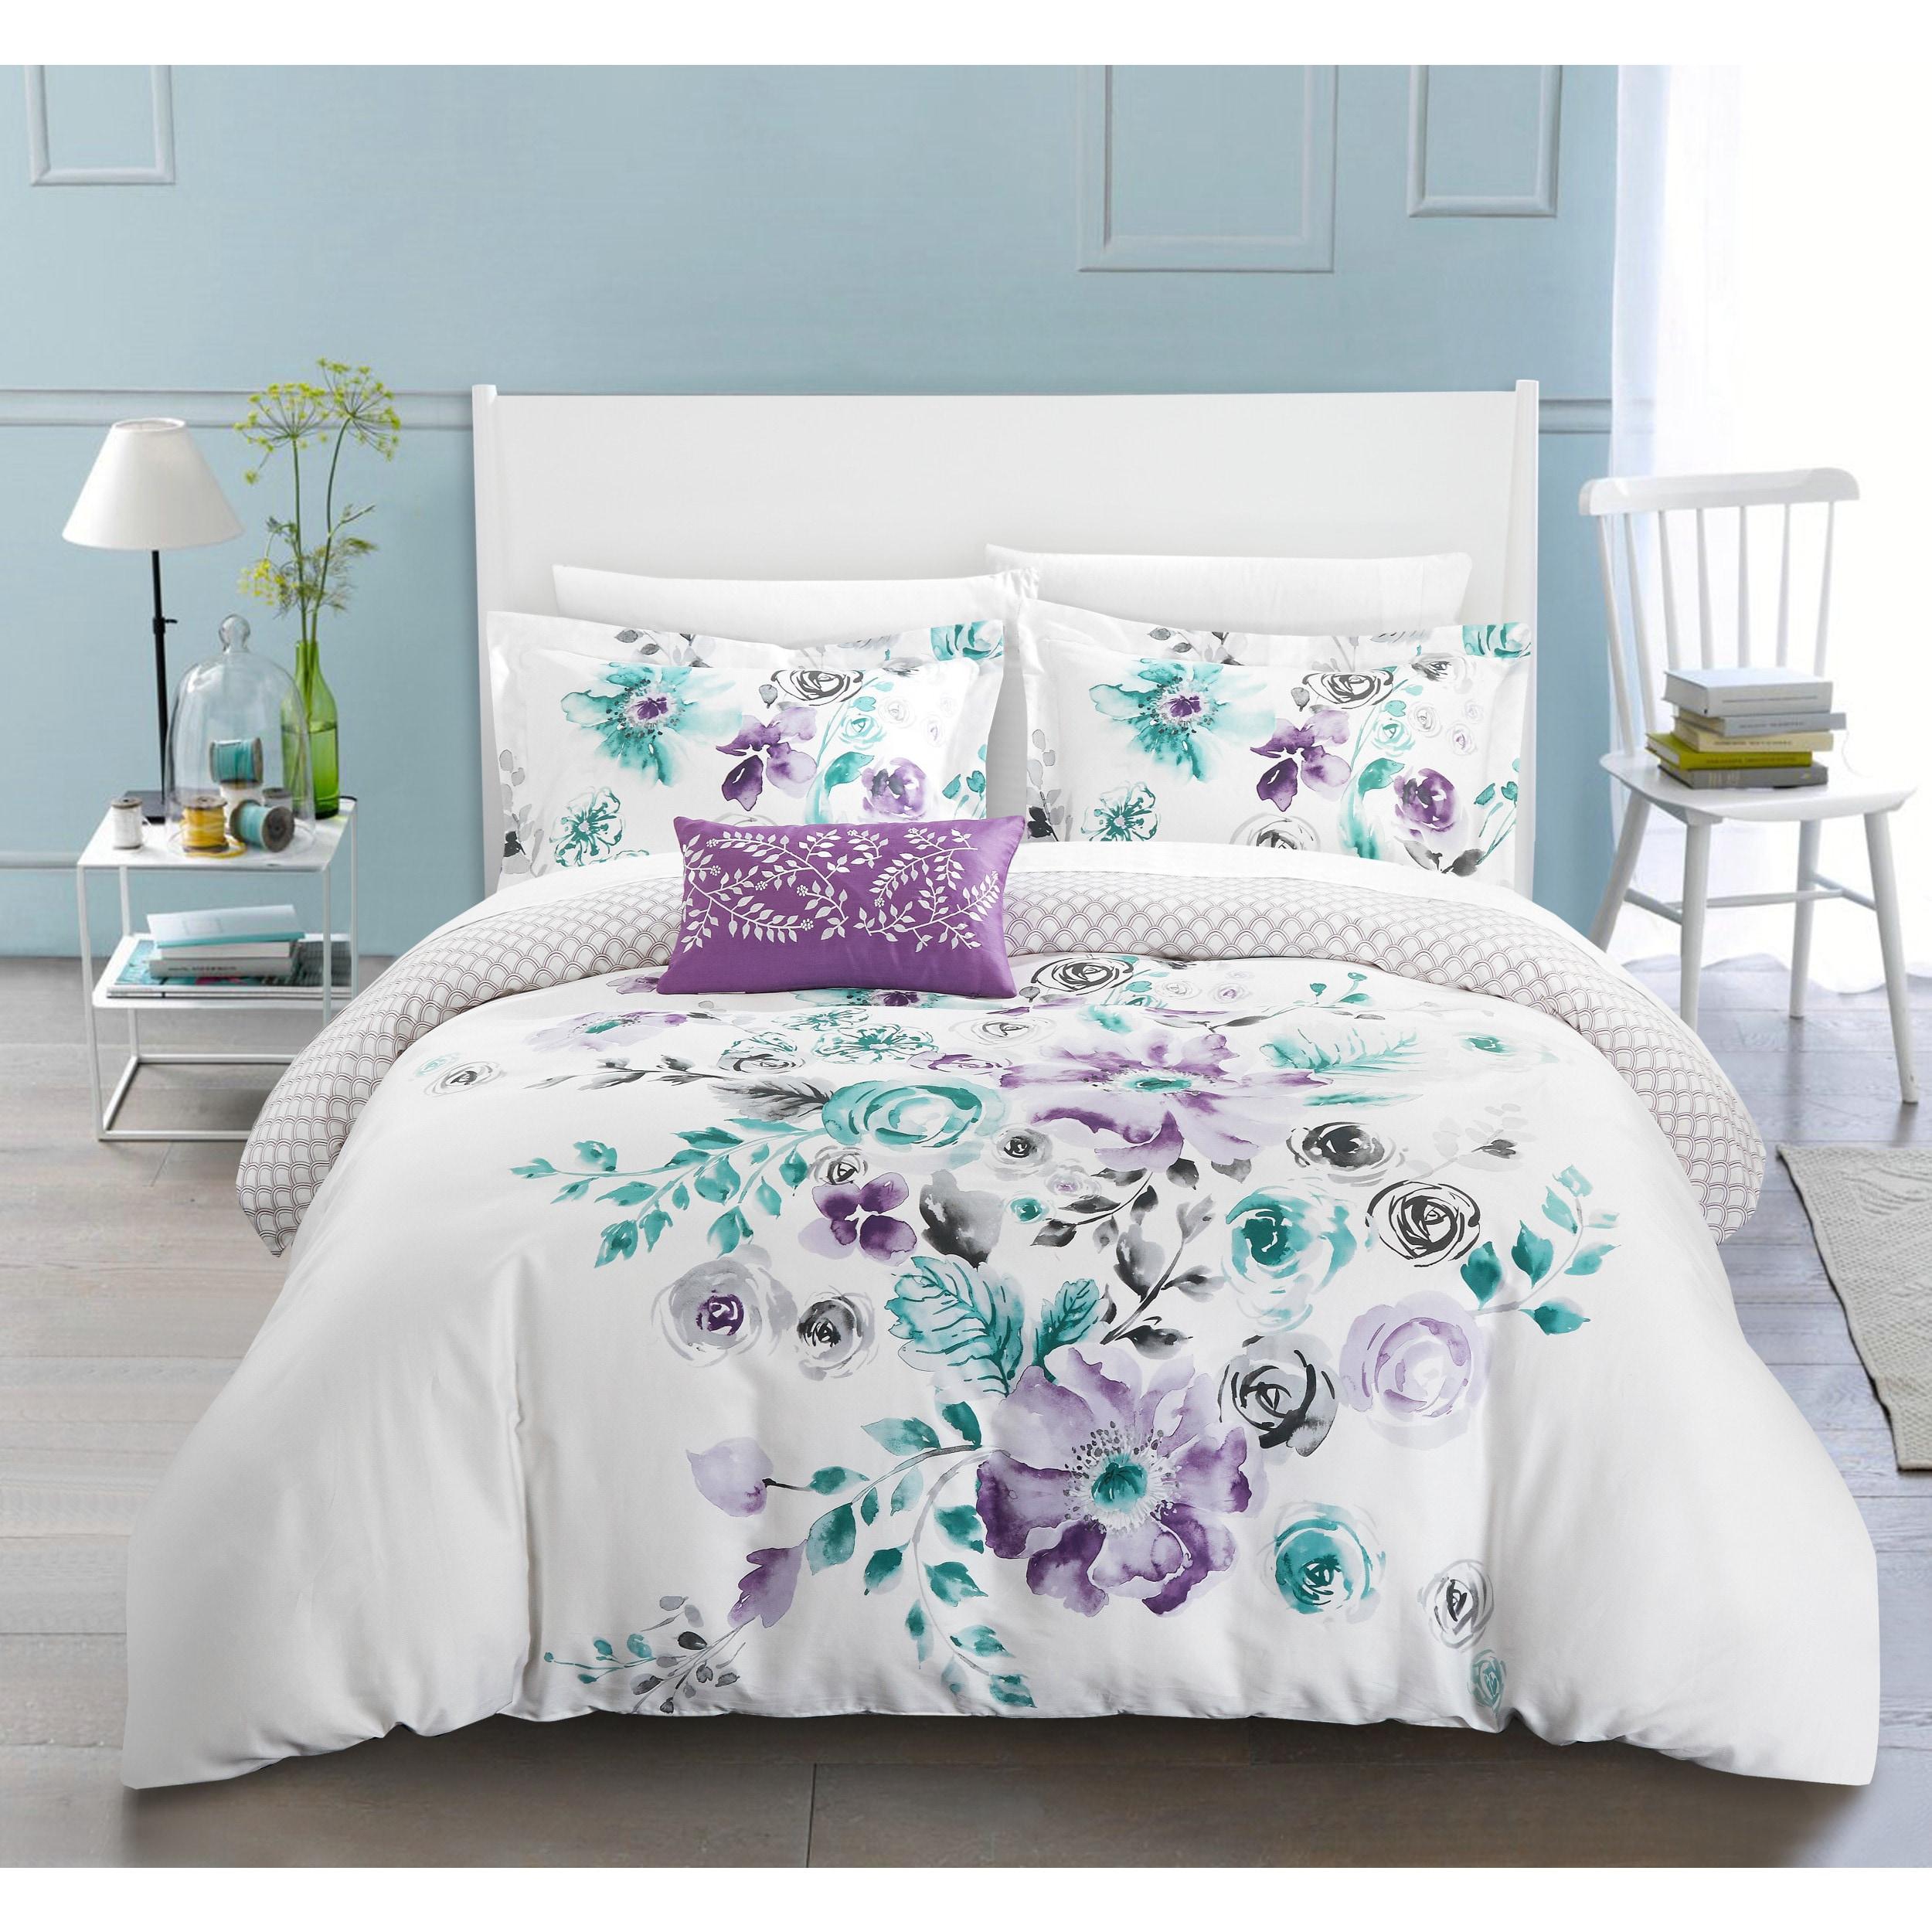 Chic Home Mitzy Lavender Floral Cotton Reversible 4 Piece Duvet Cover Set On Sale Overstock 18038243